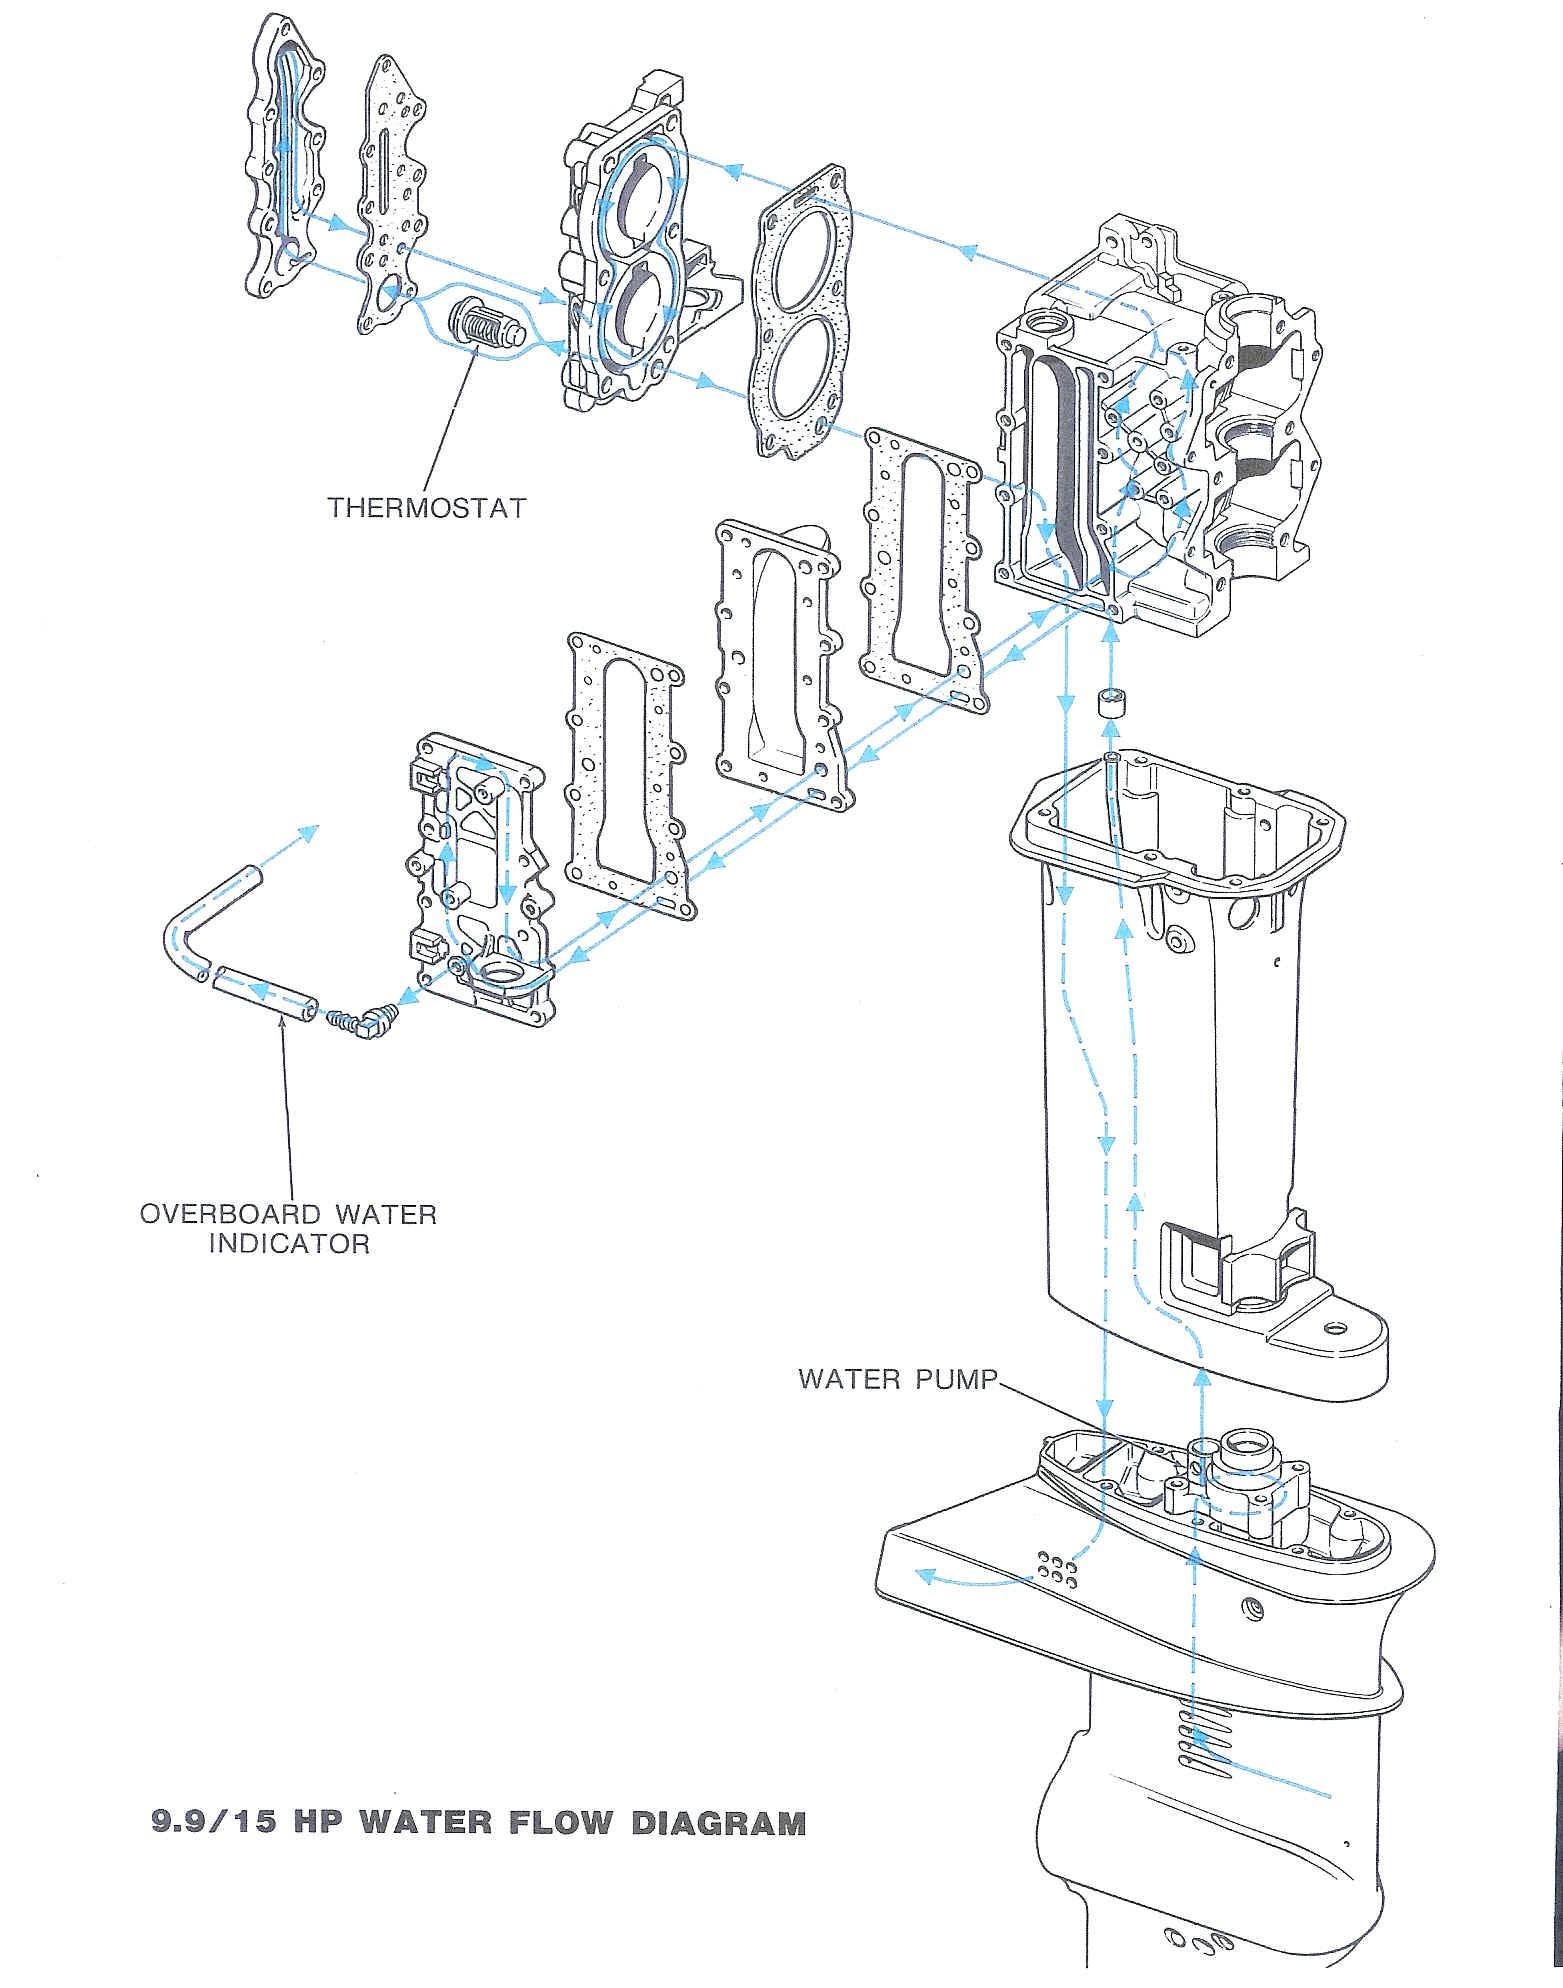 Jet Boat Engine Diagram Maintaining Johnson Evinrude 9 9 Part 1 Of Jet Boat Engine Diagram